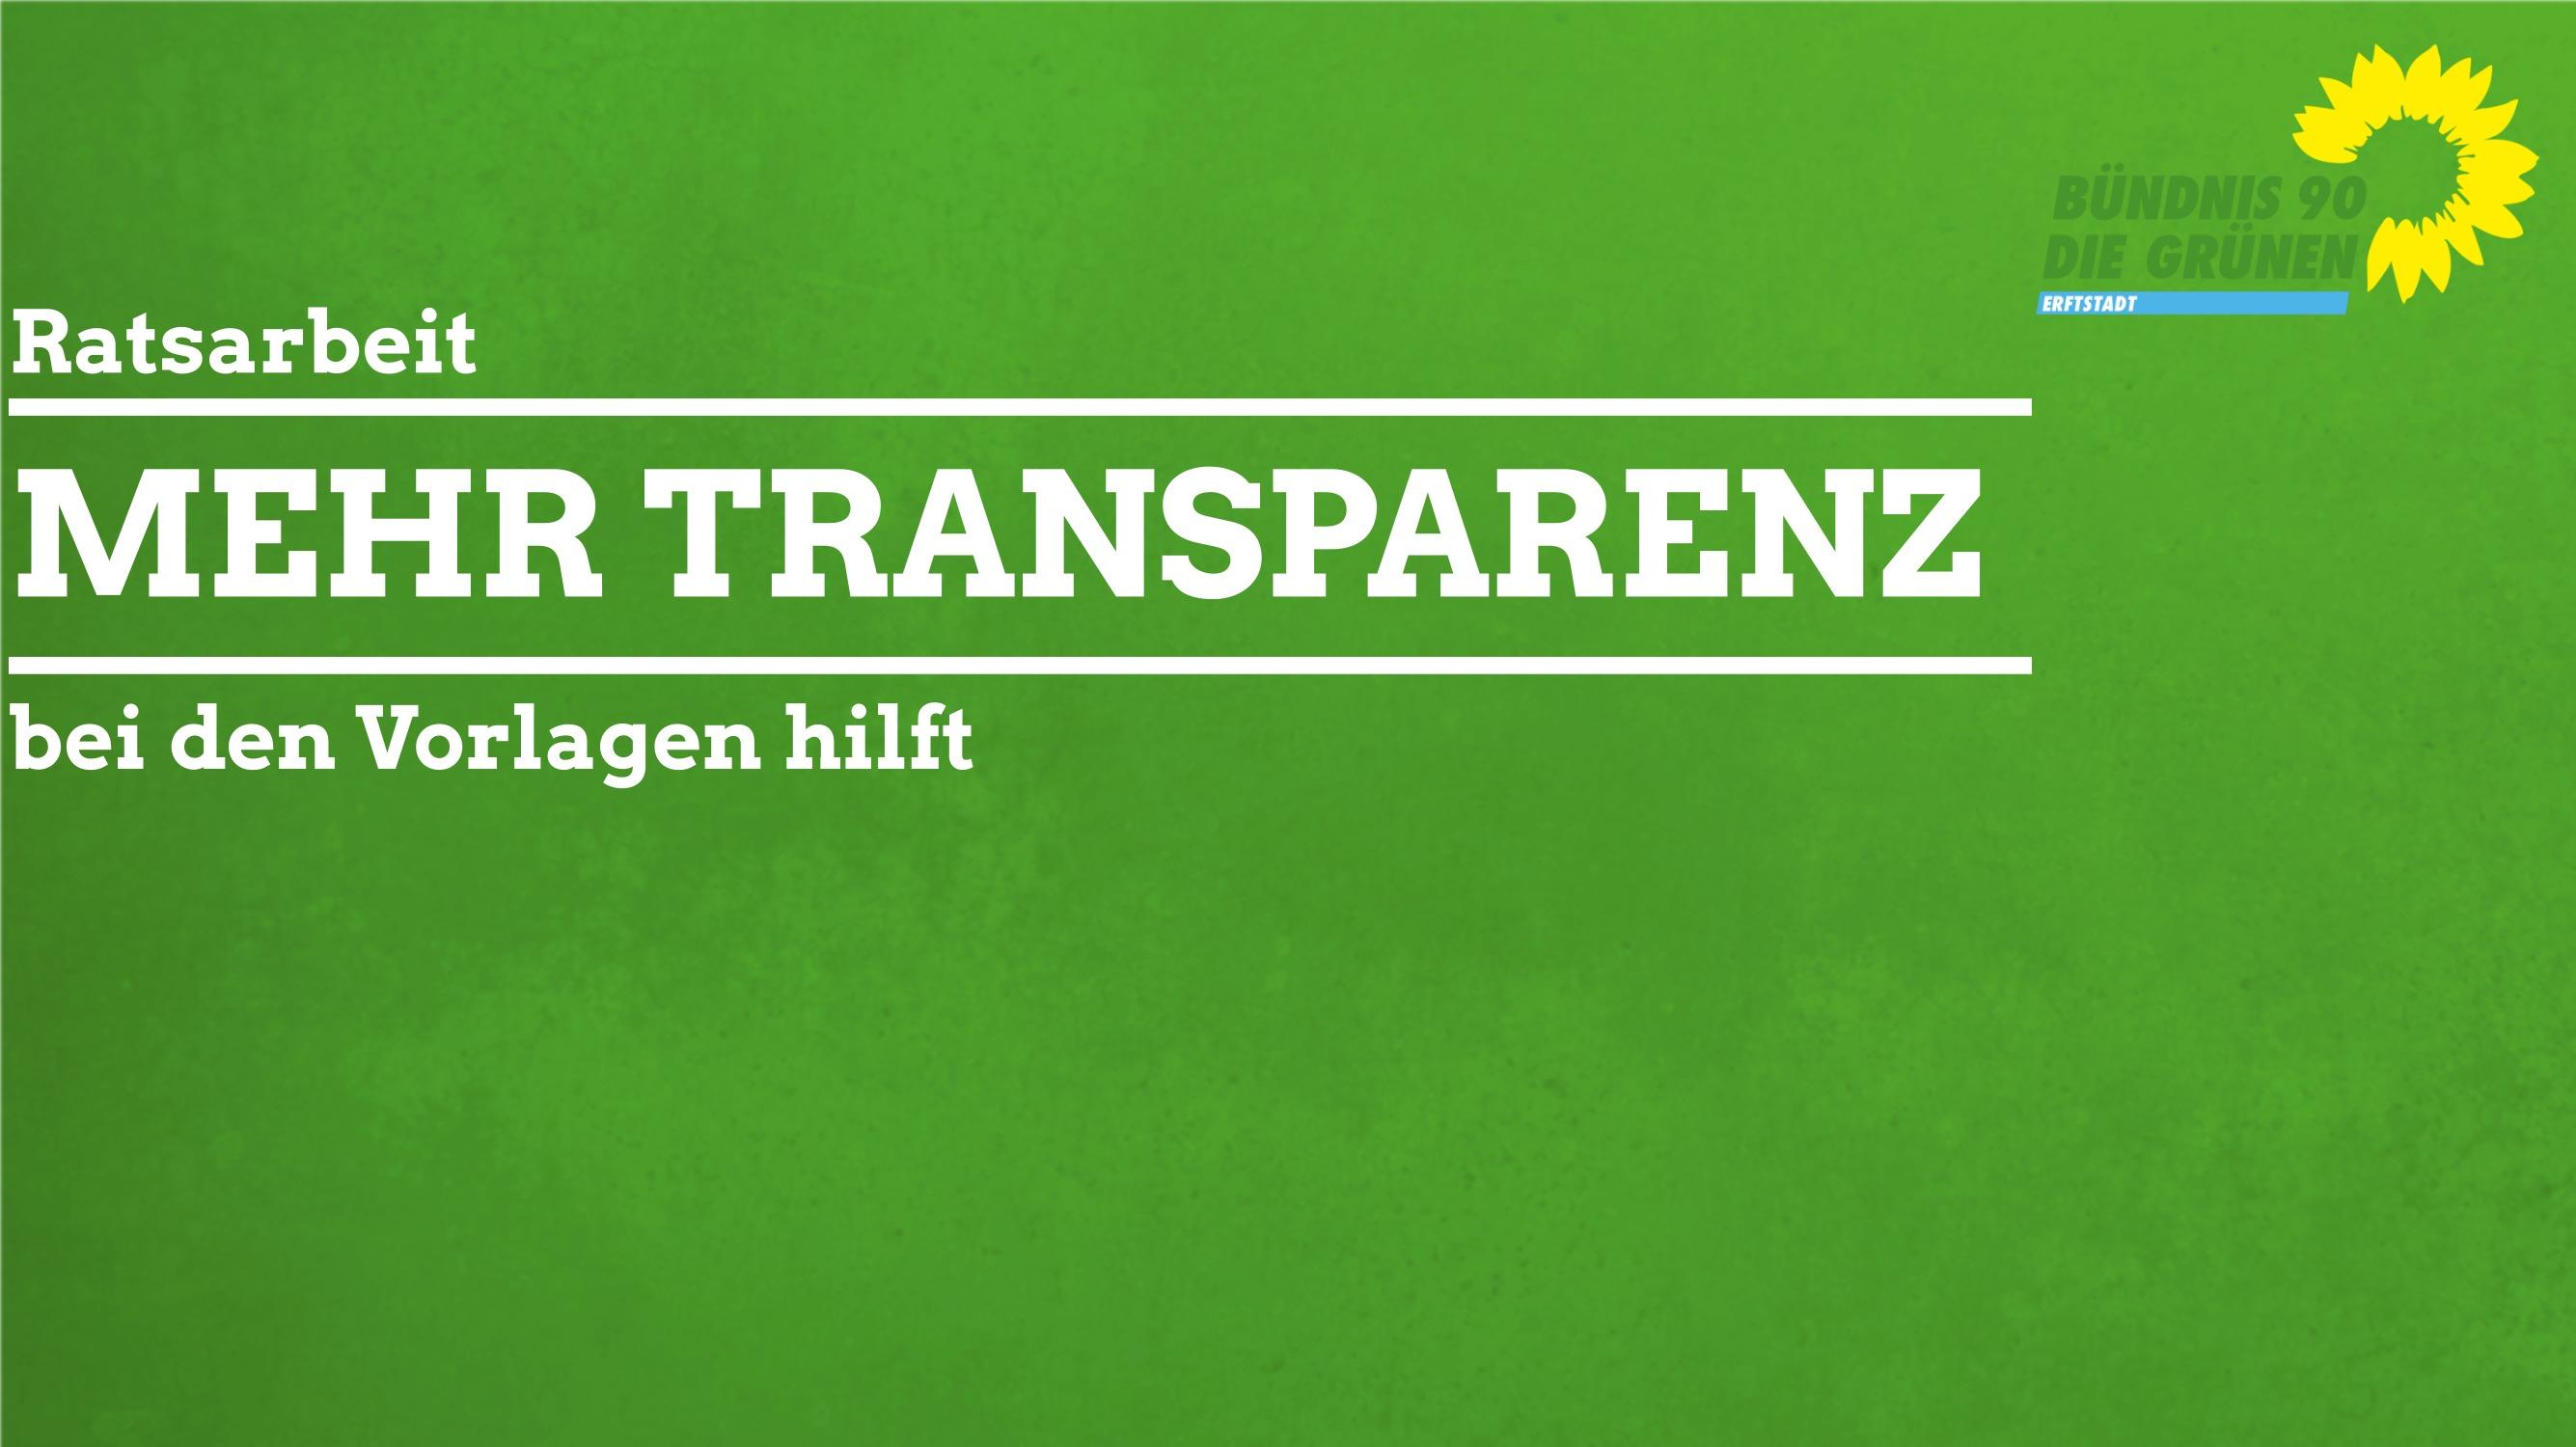 Erhöhung der Transparenz